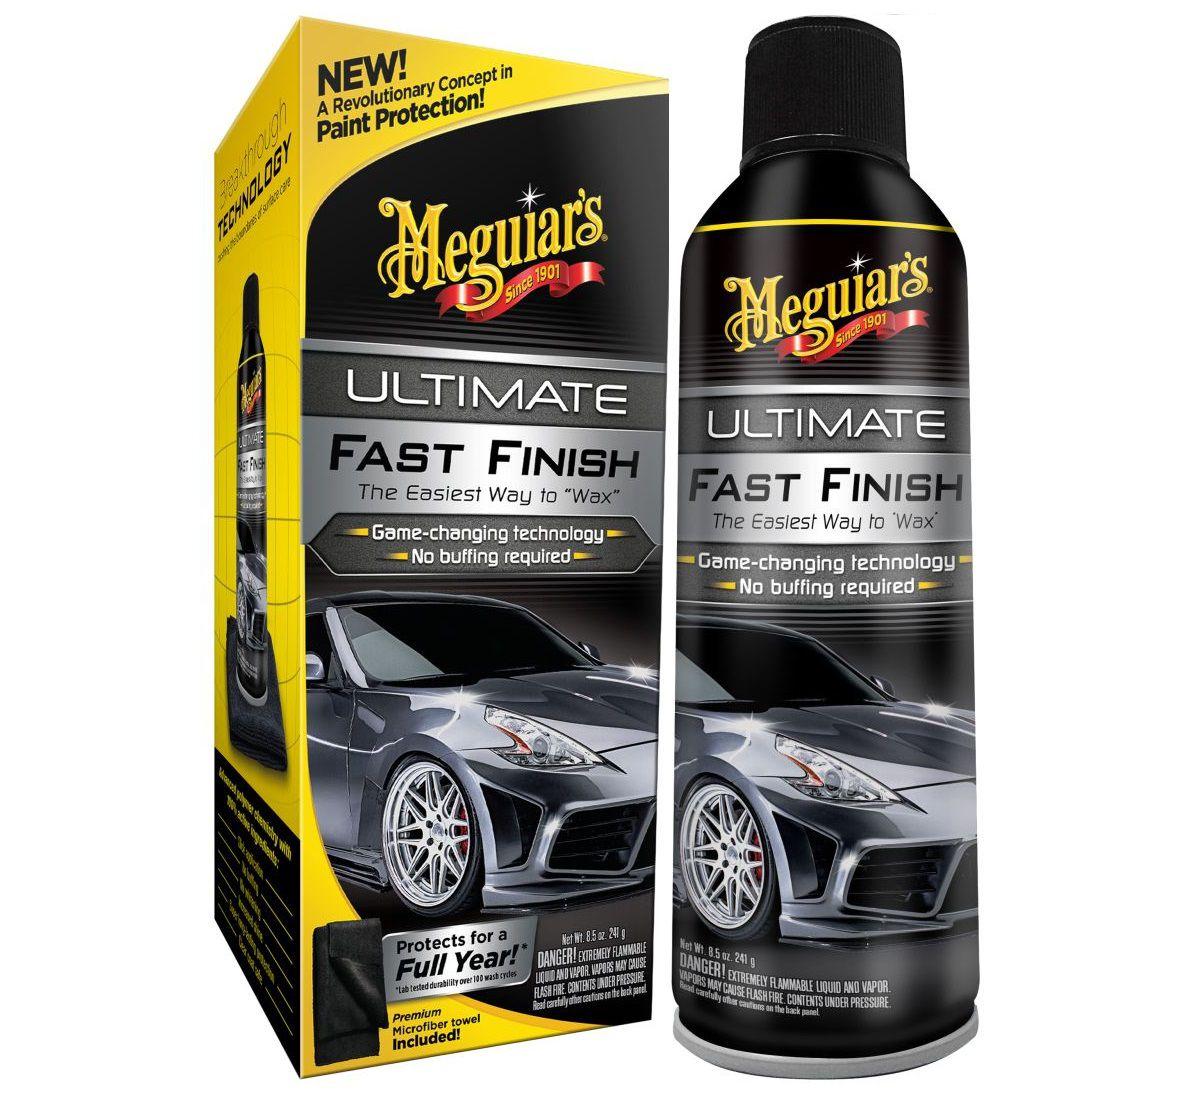 Cera Protetora Spray Ultimate Fast Finish 251,4ml Meguiars + Boné Brinde